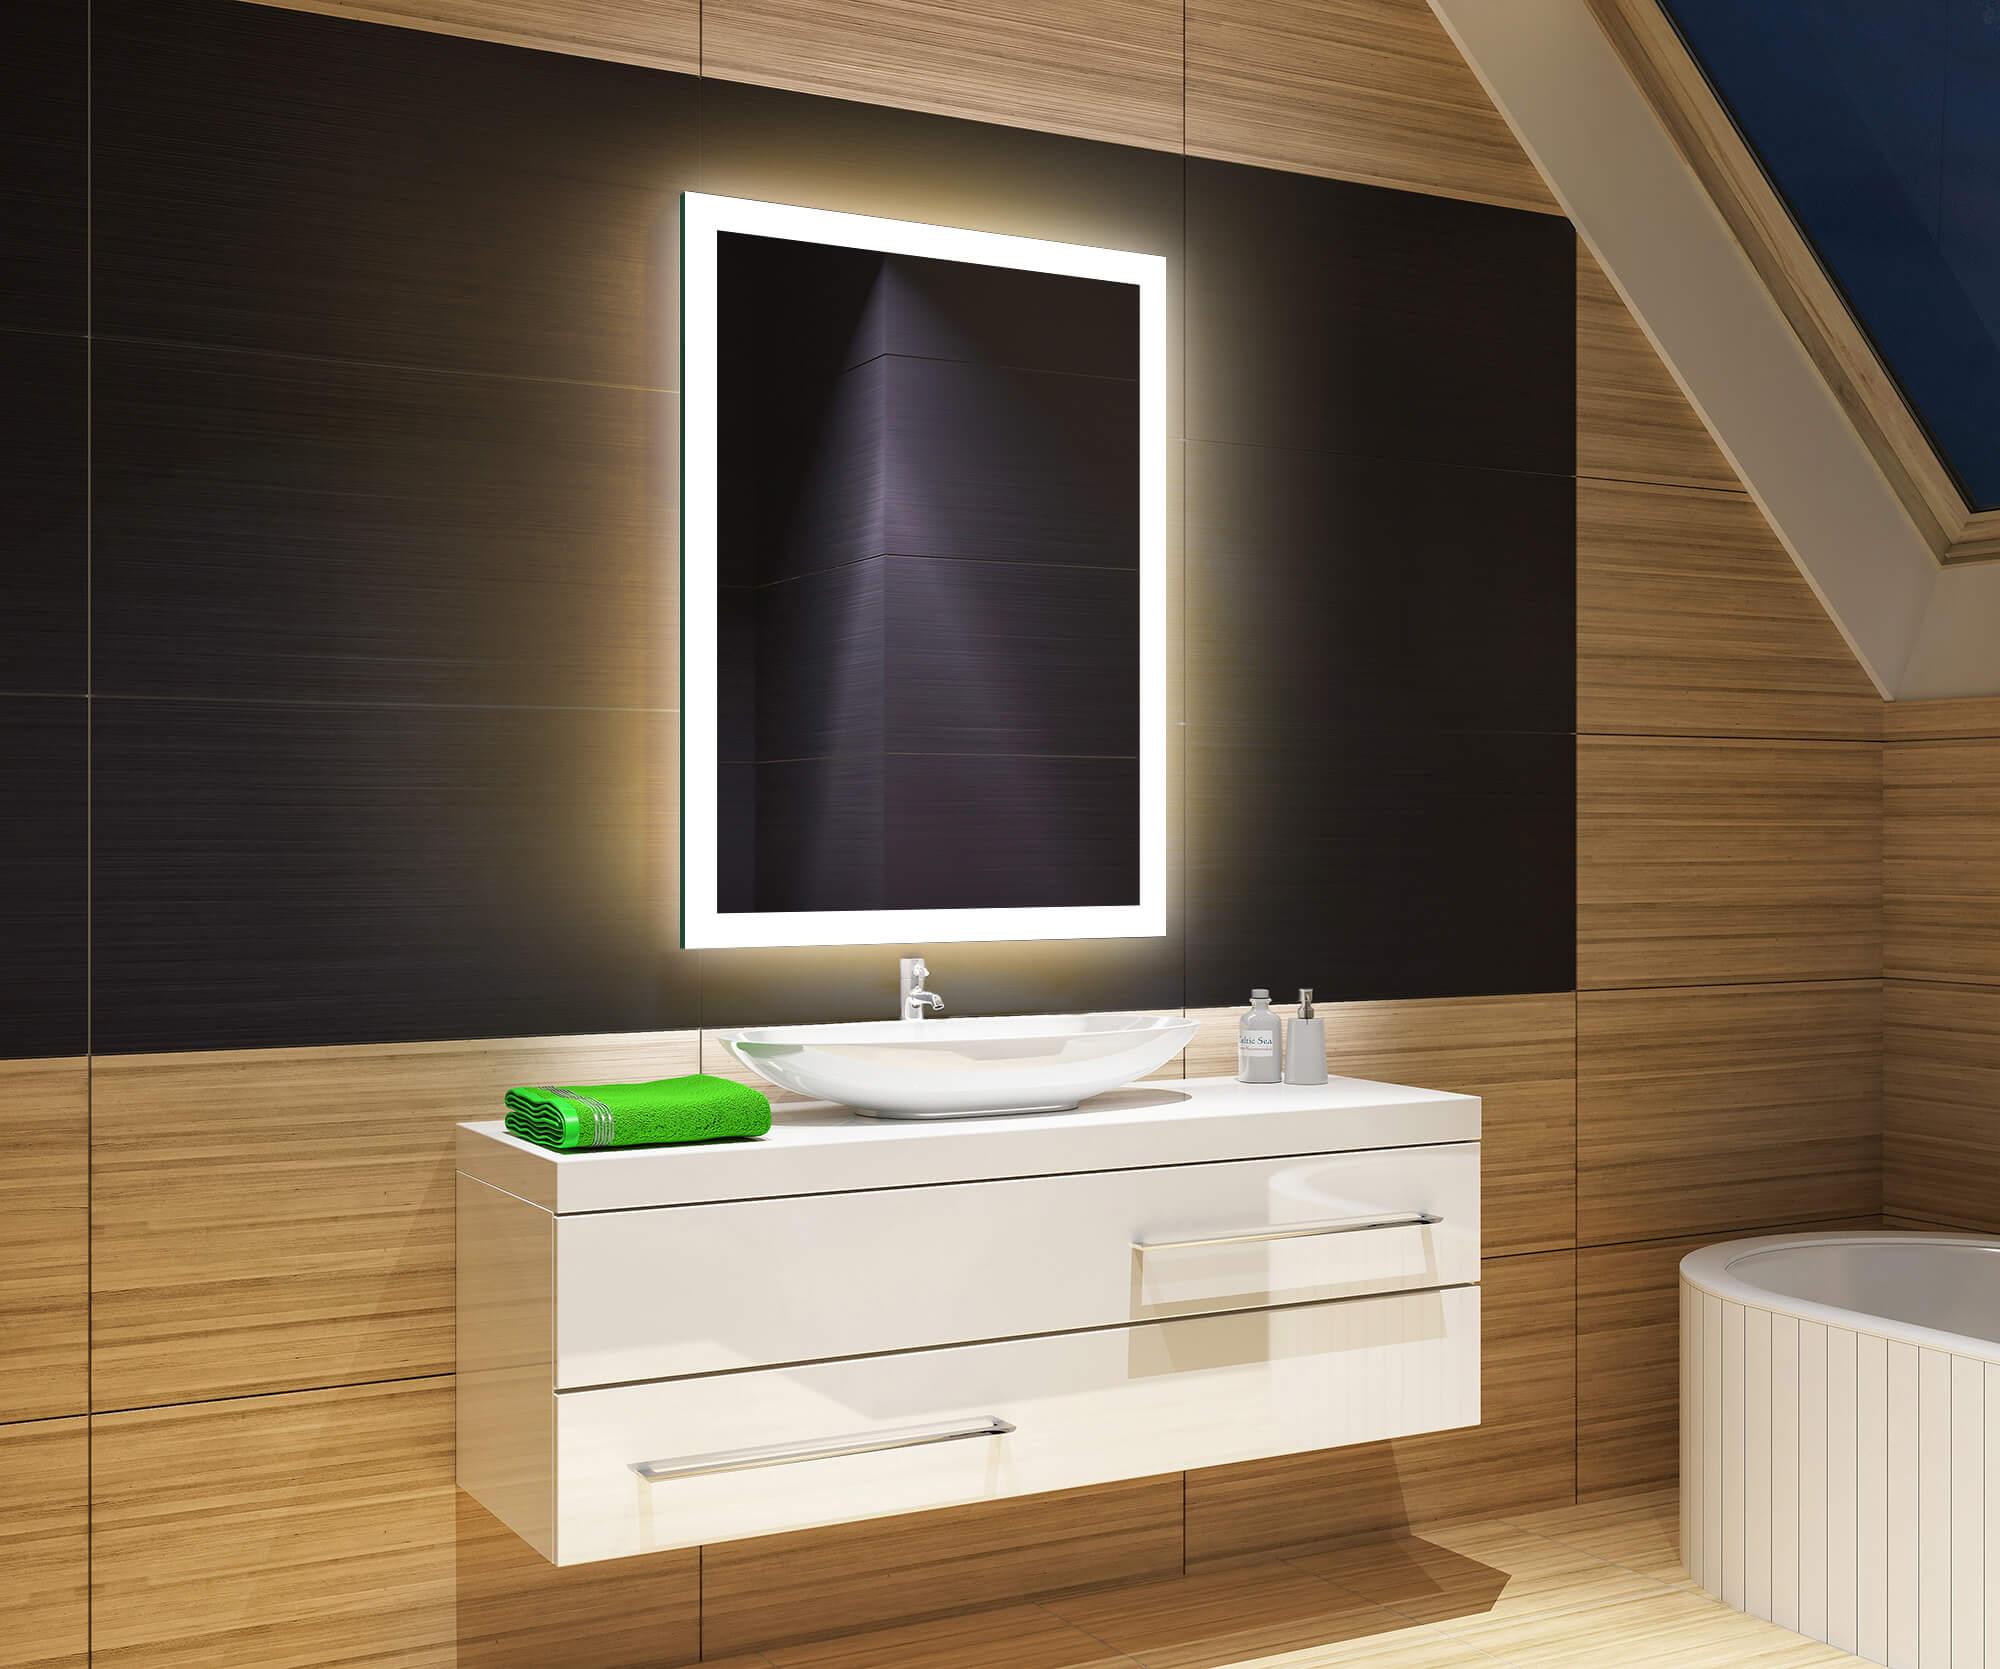 badspiegel mit led beleuchtung wandspiegel badezimmer spiegel 50x70 bcm1315am ebay. Black Bedroom Furniture Sets. Home Design Ideas